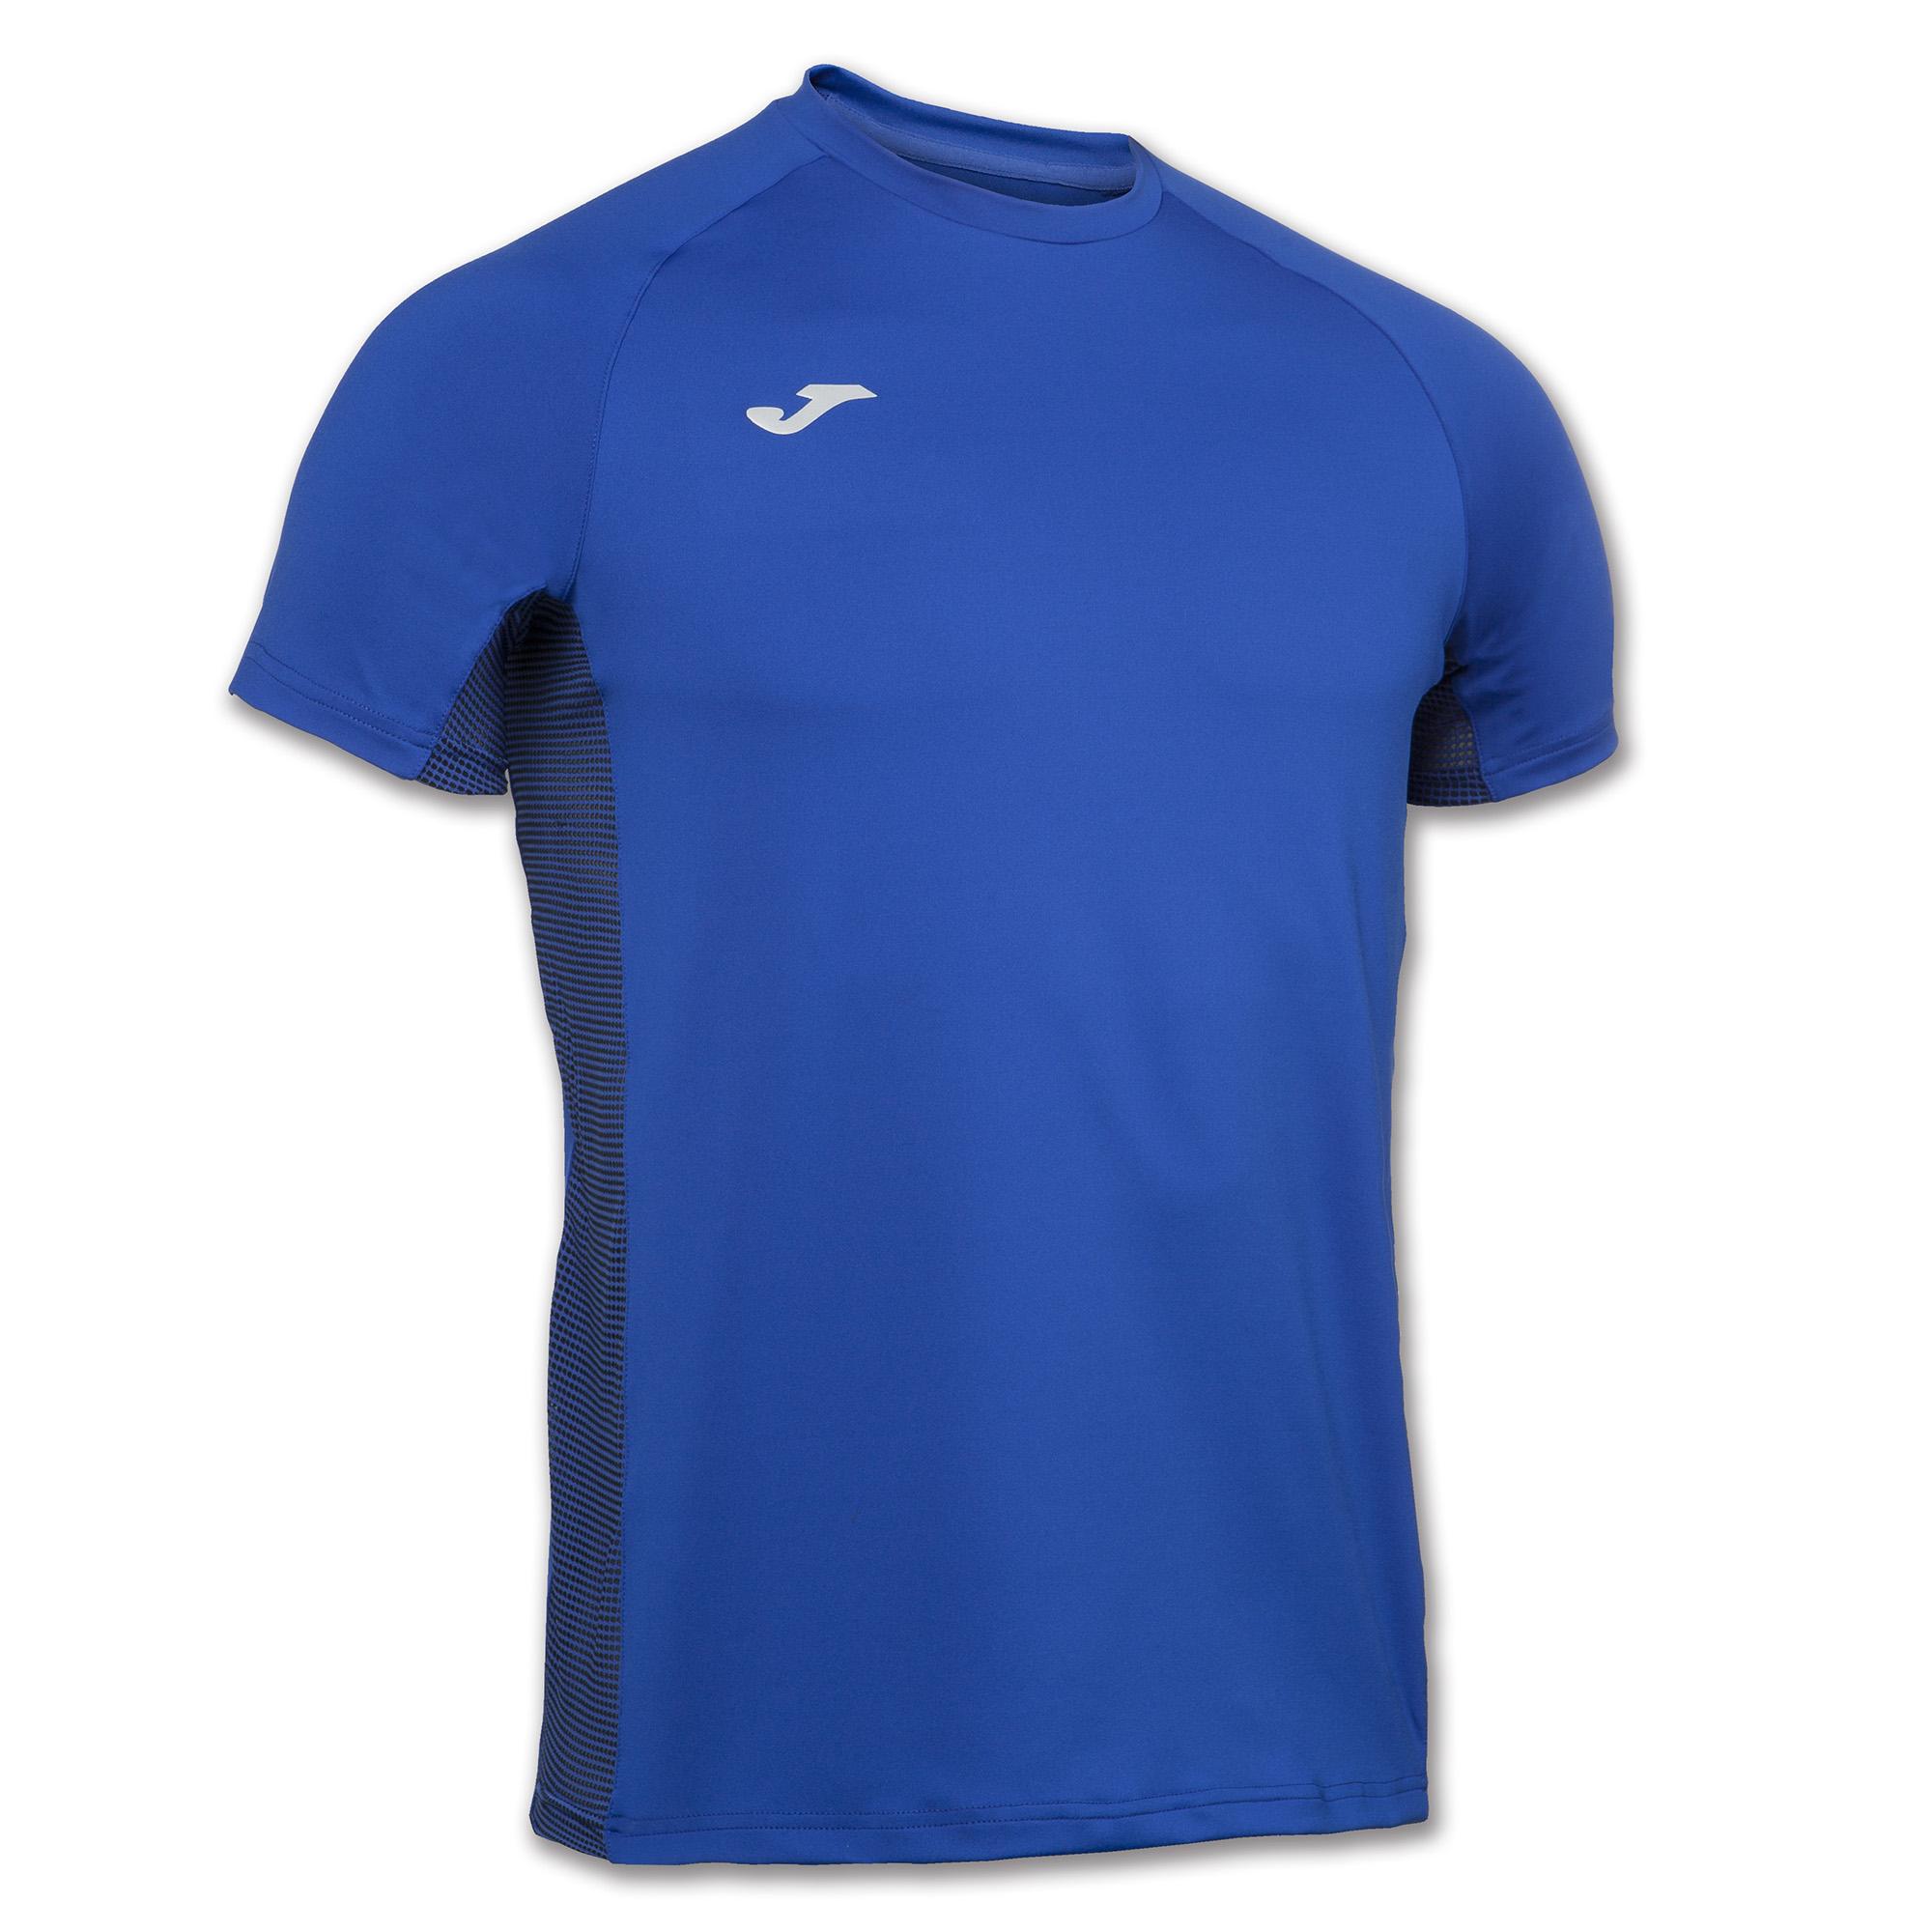 Joma - Løbe t-shirt - Herre - Royal blå | Jerseys